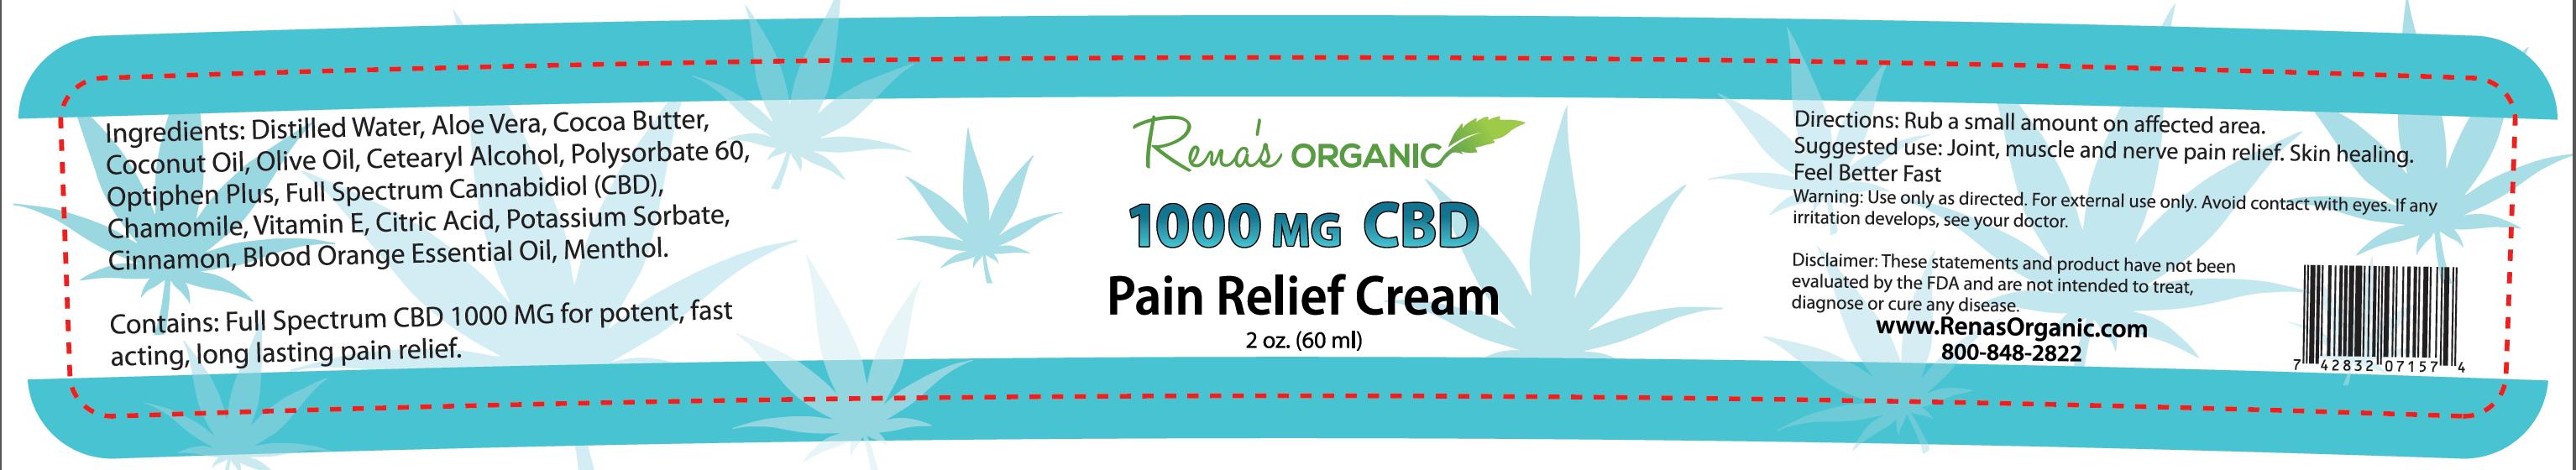 1000 mg pain relief cream label